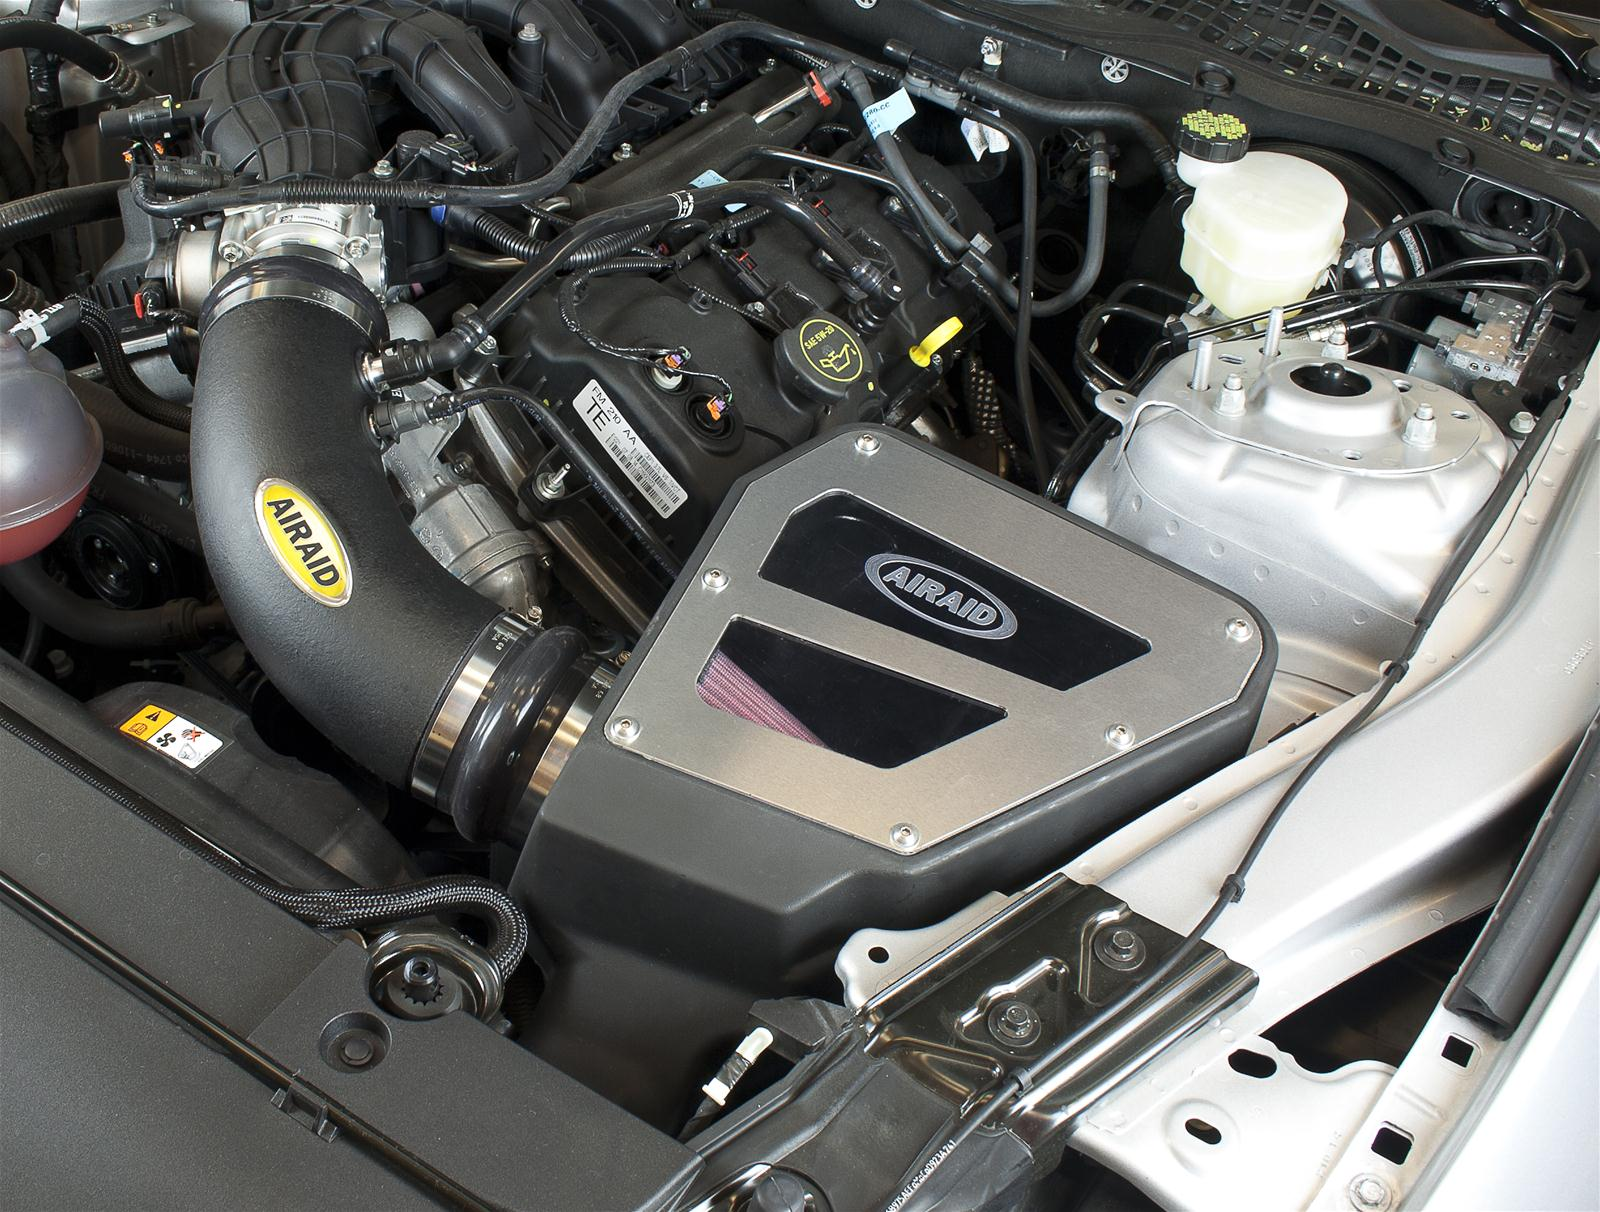 Parts Bin Airaid Intake For The 2015 V6 Mustang